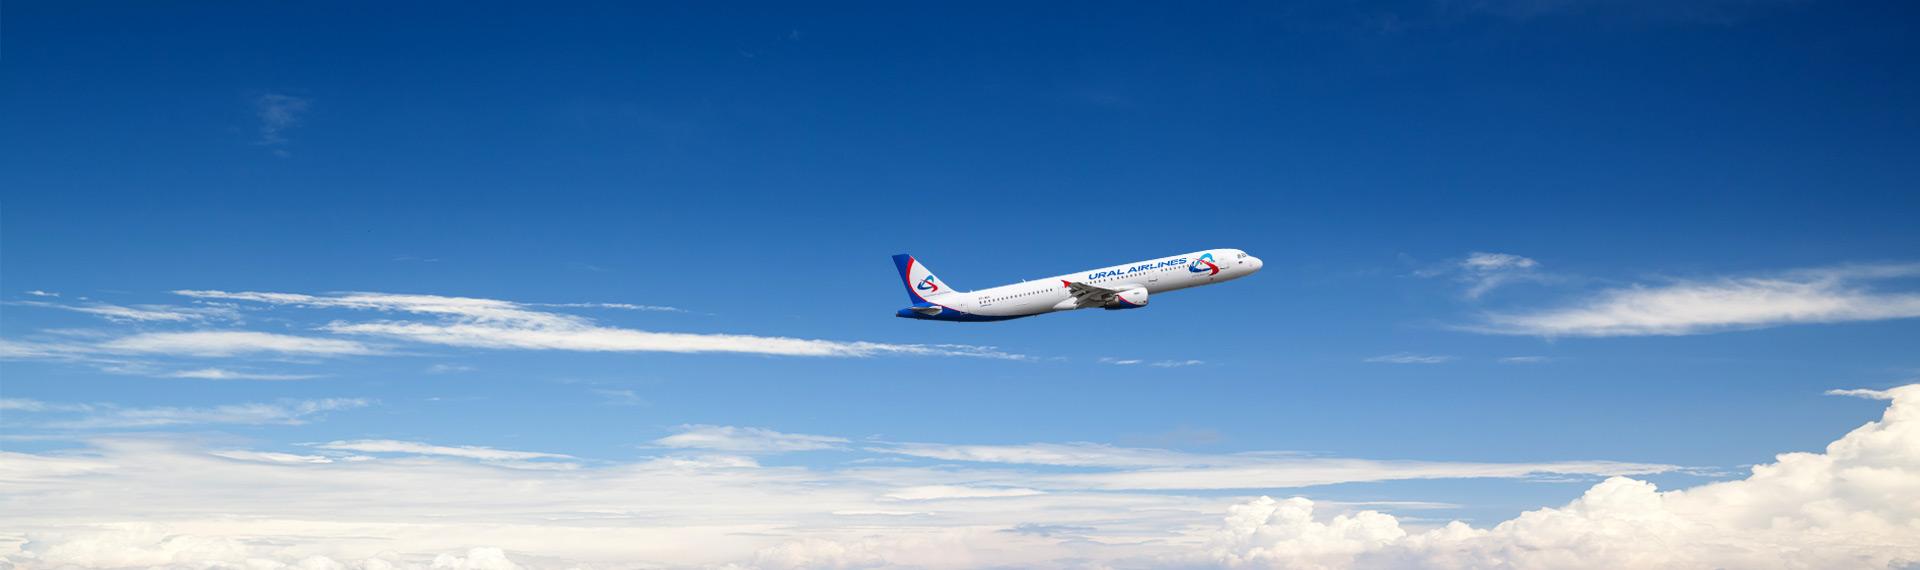 Ural Airlines (U6) Flight Deals & Reservations - Lookupfare